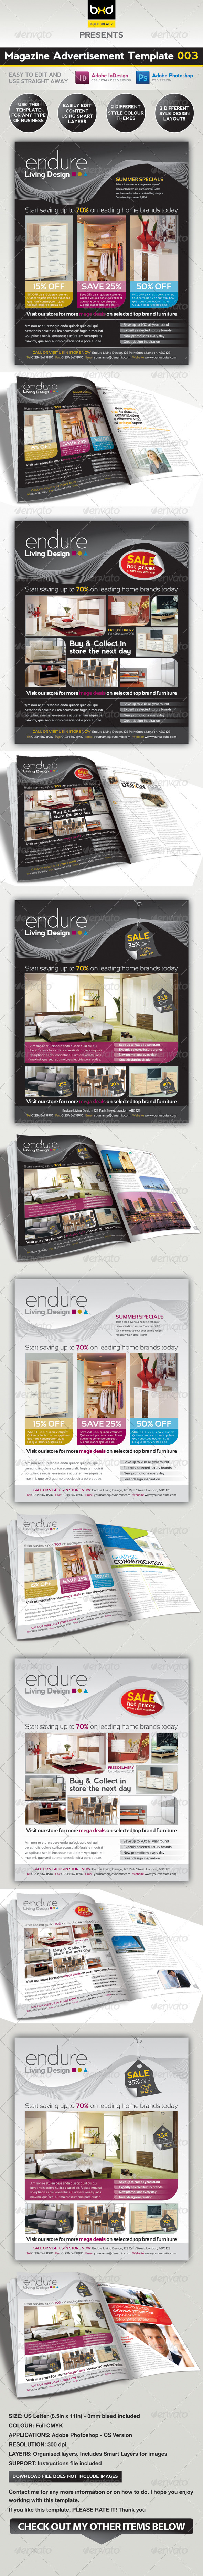 GraphicRiver Magazine Advert Template 003 694829